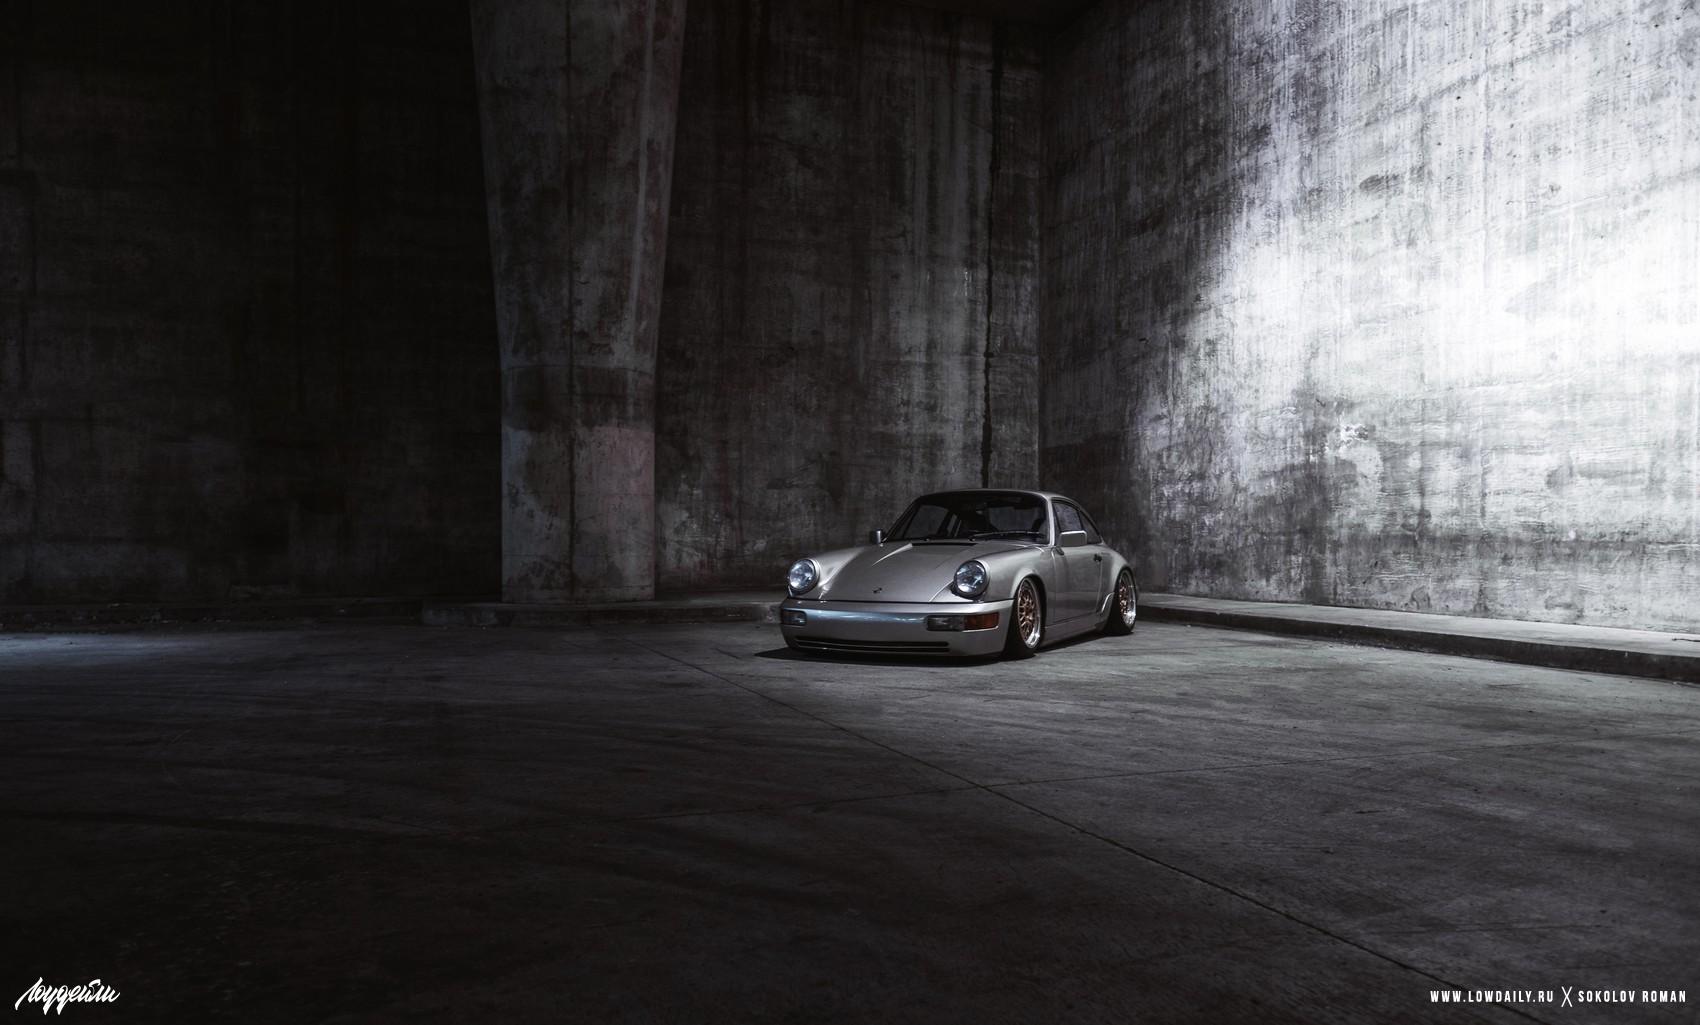 1989 Porsche Carrera 4 (964) DSCF3257